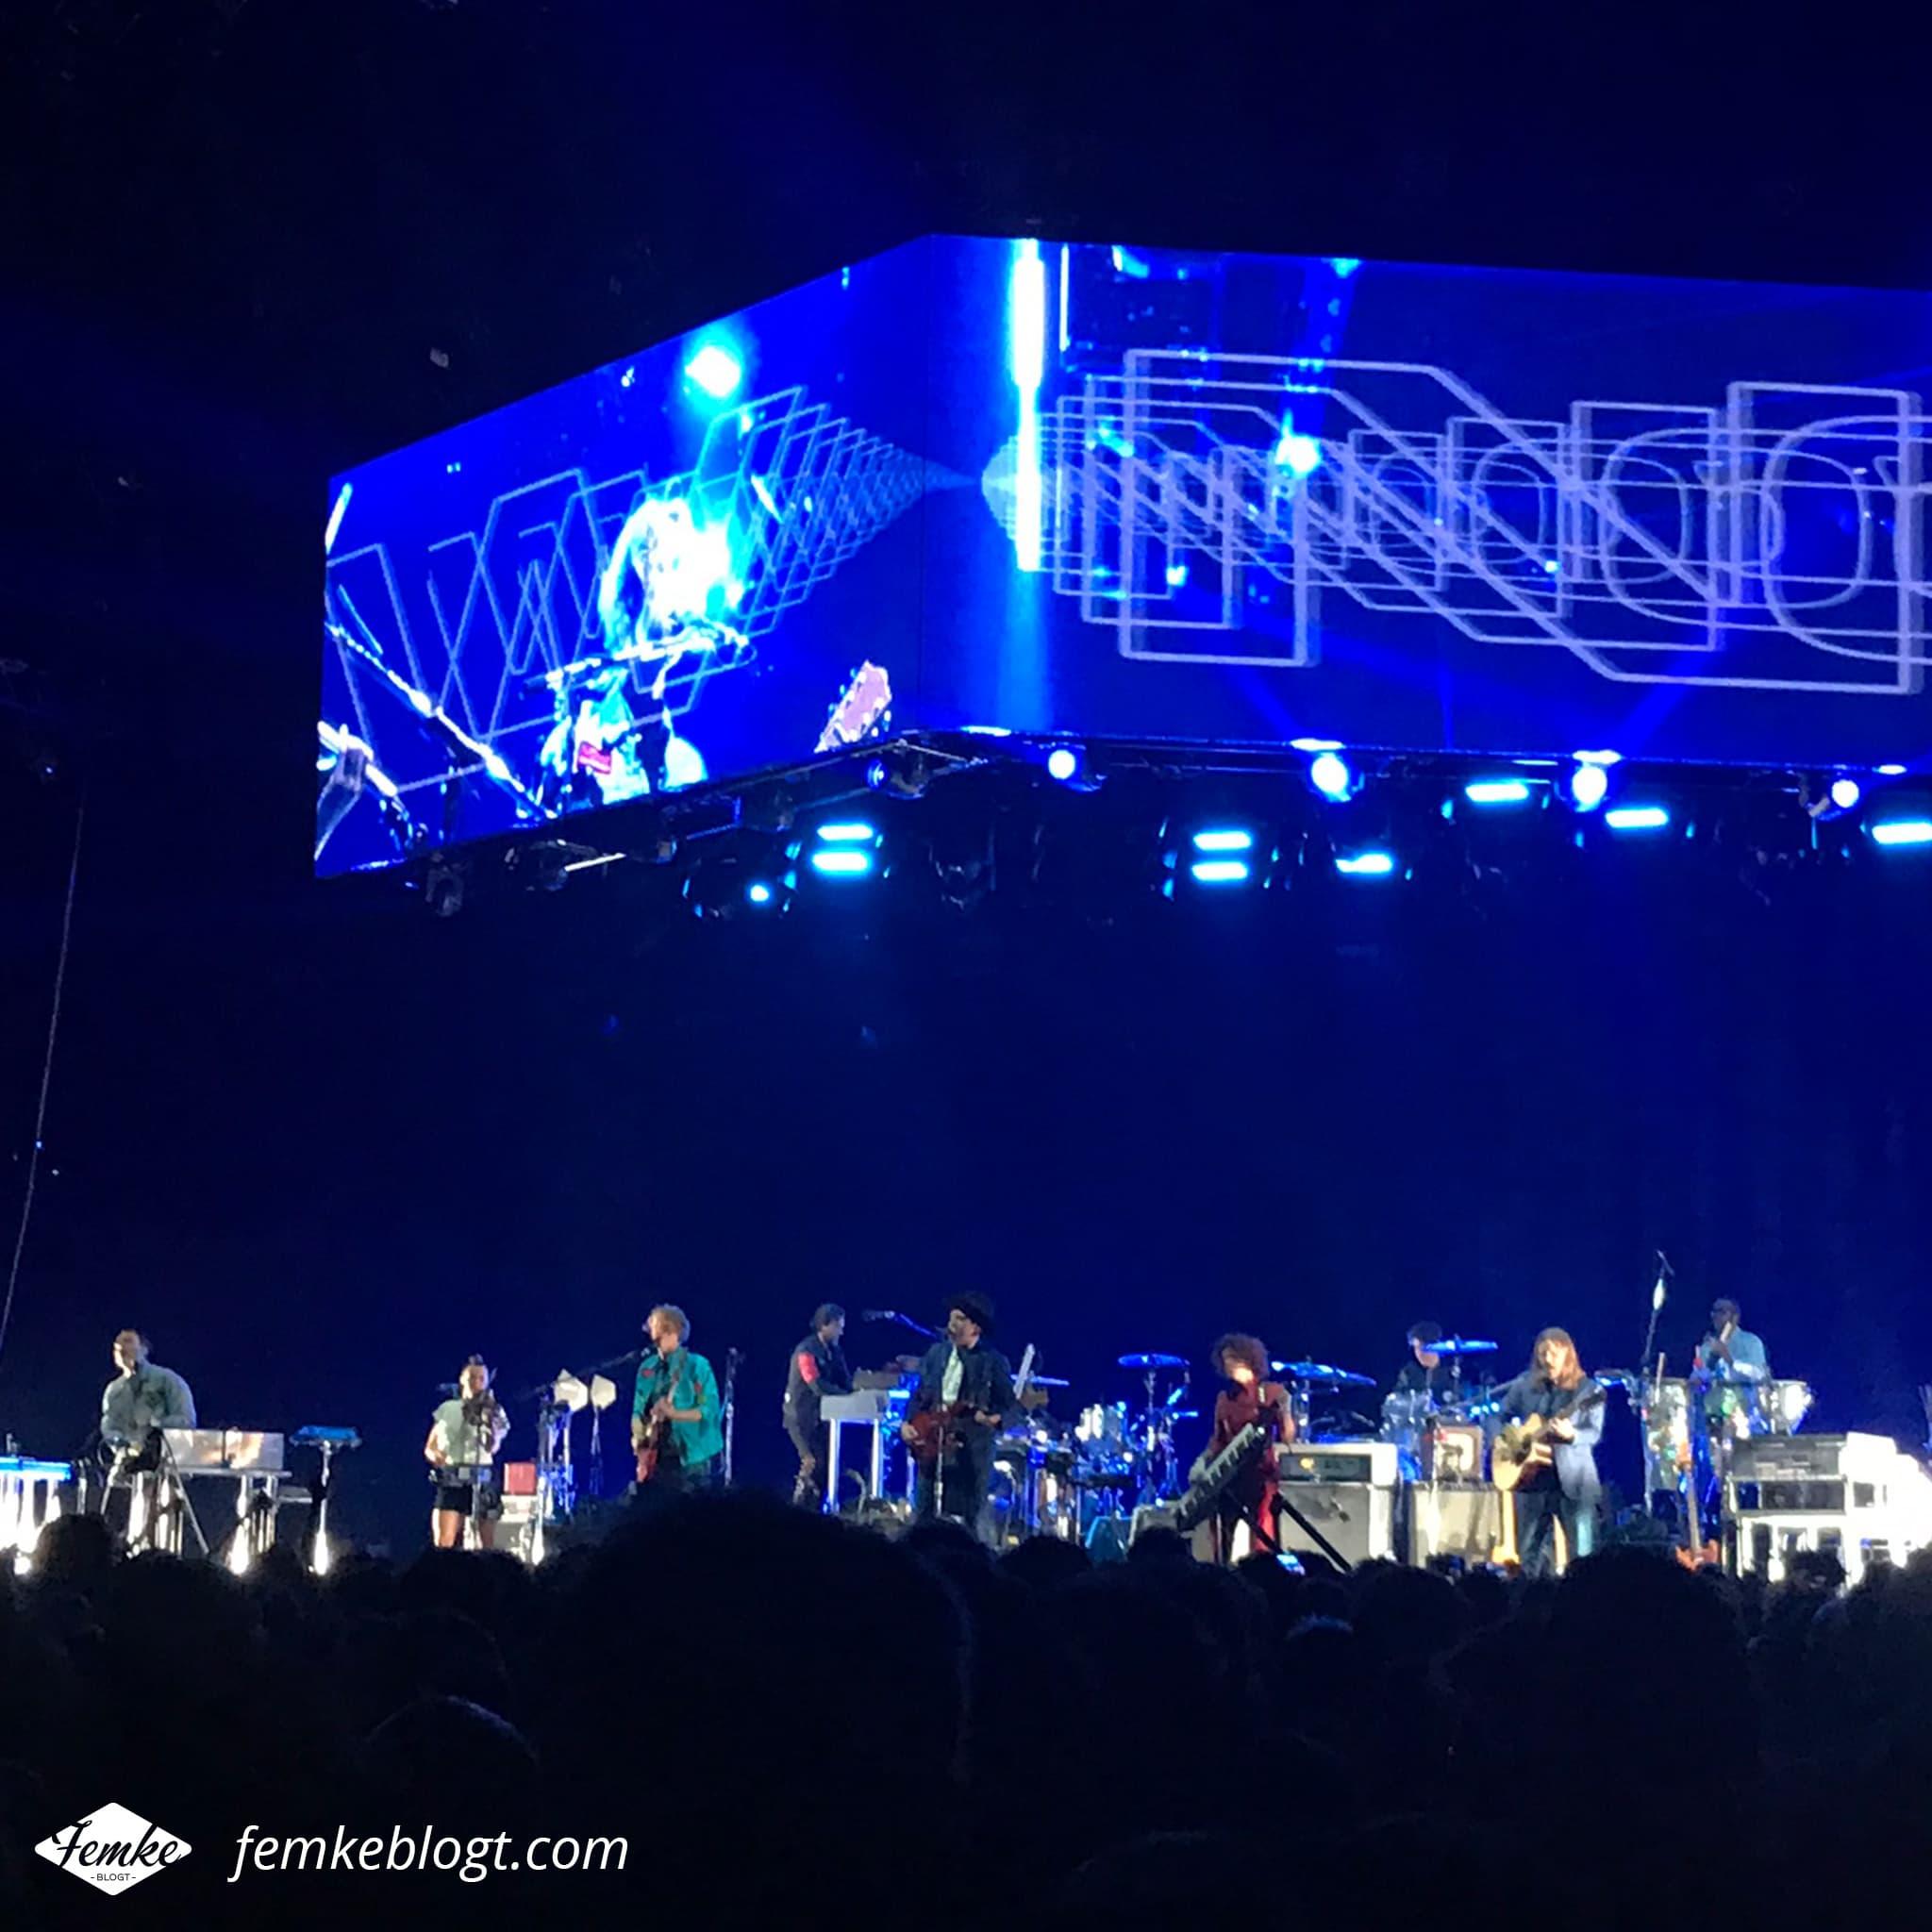 Maandoverzicht juni | Concert Arcade Fire